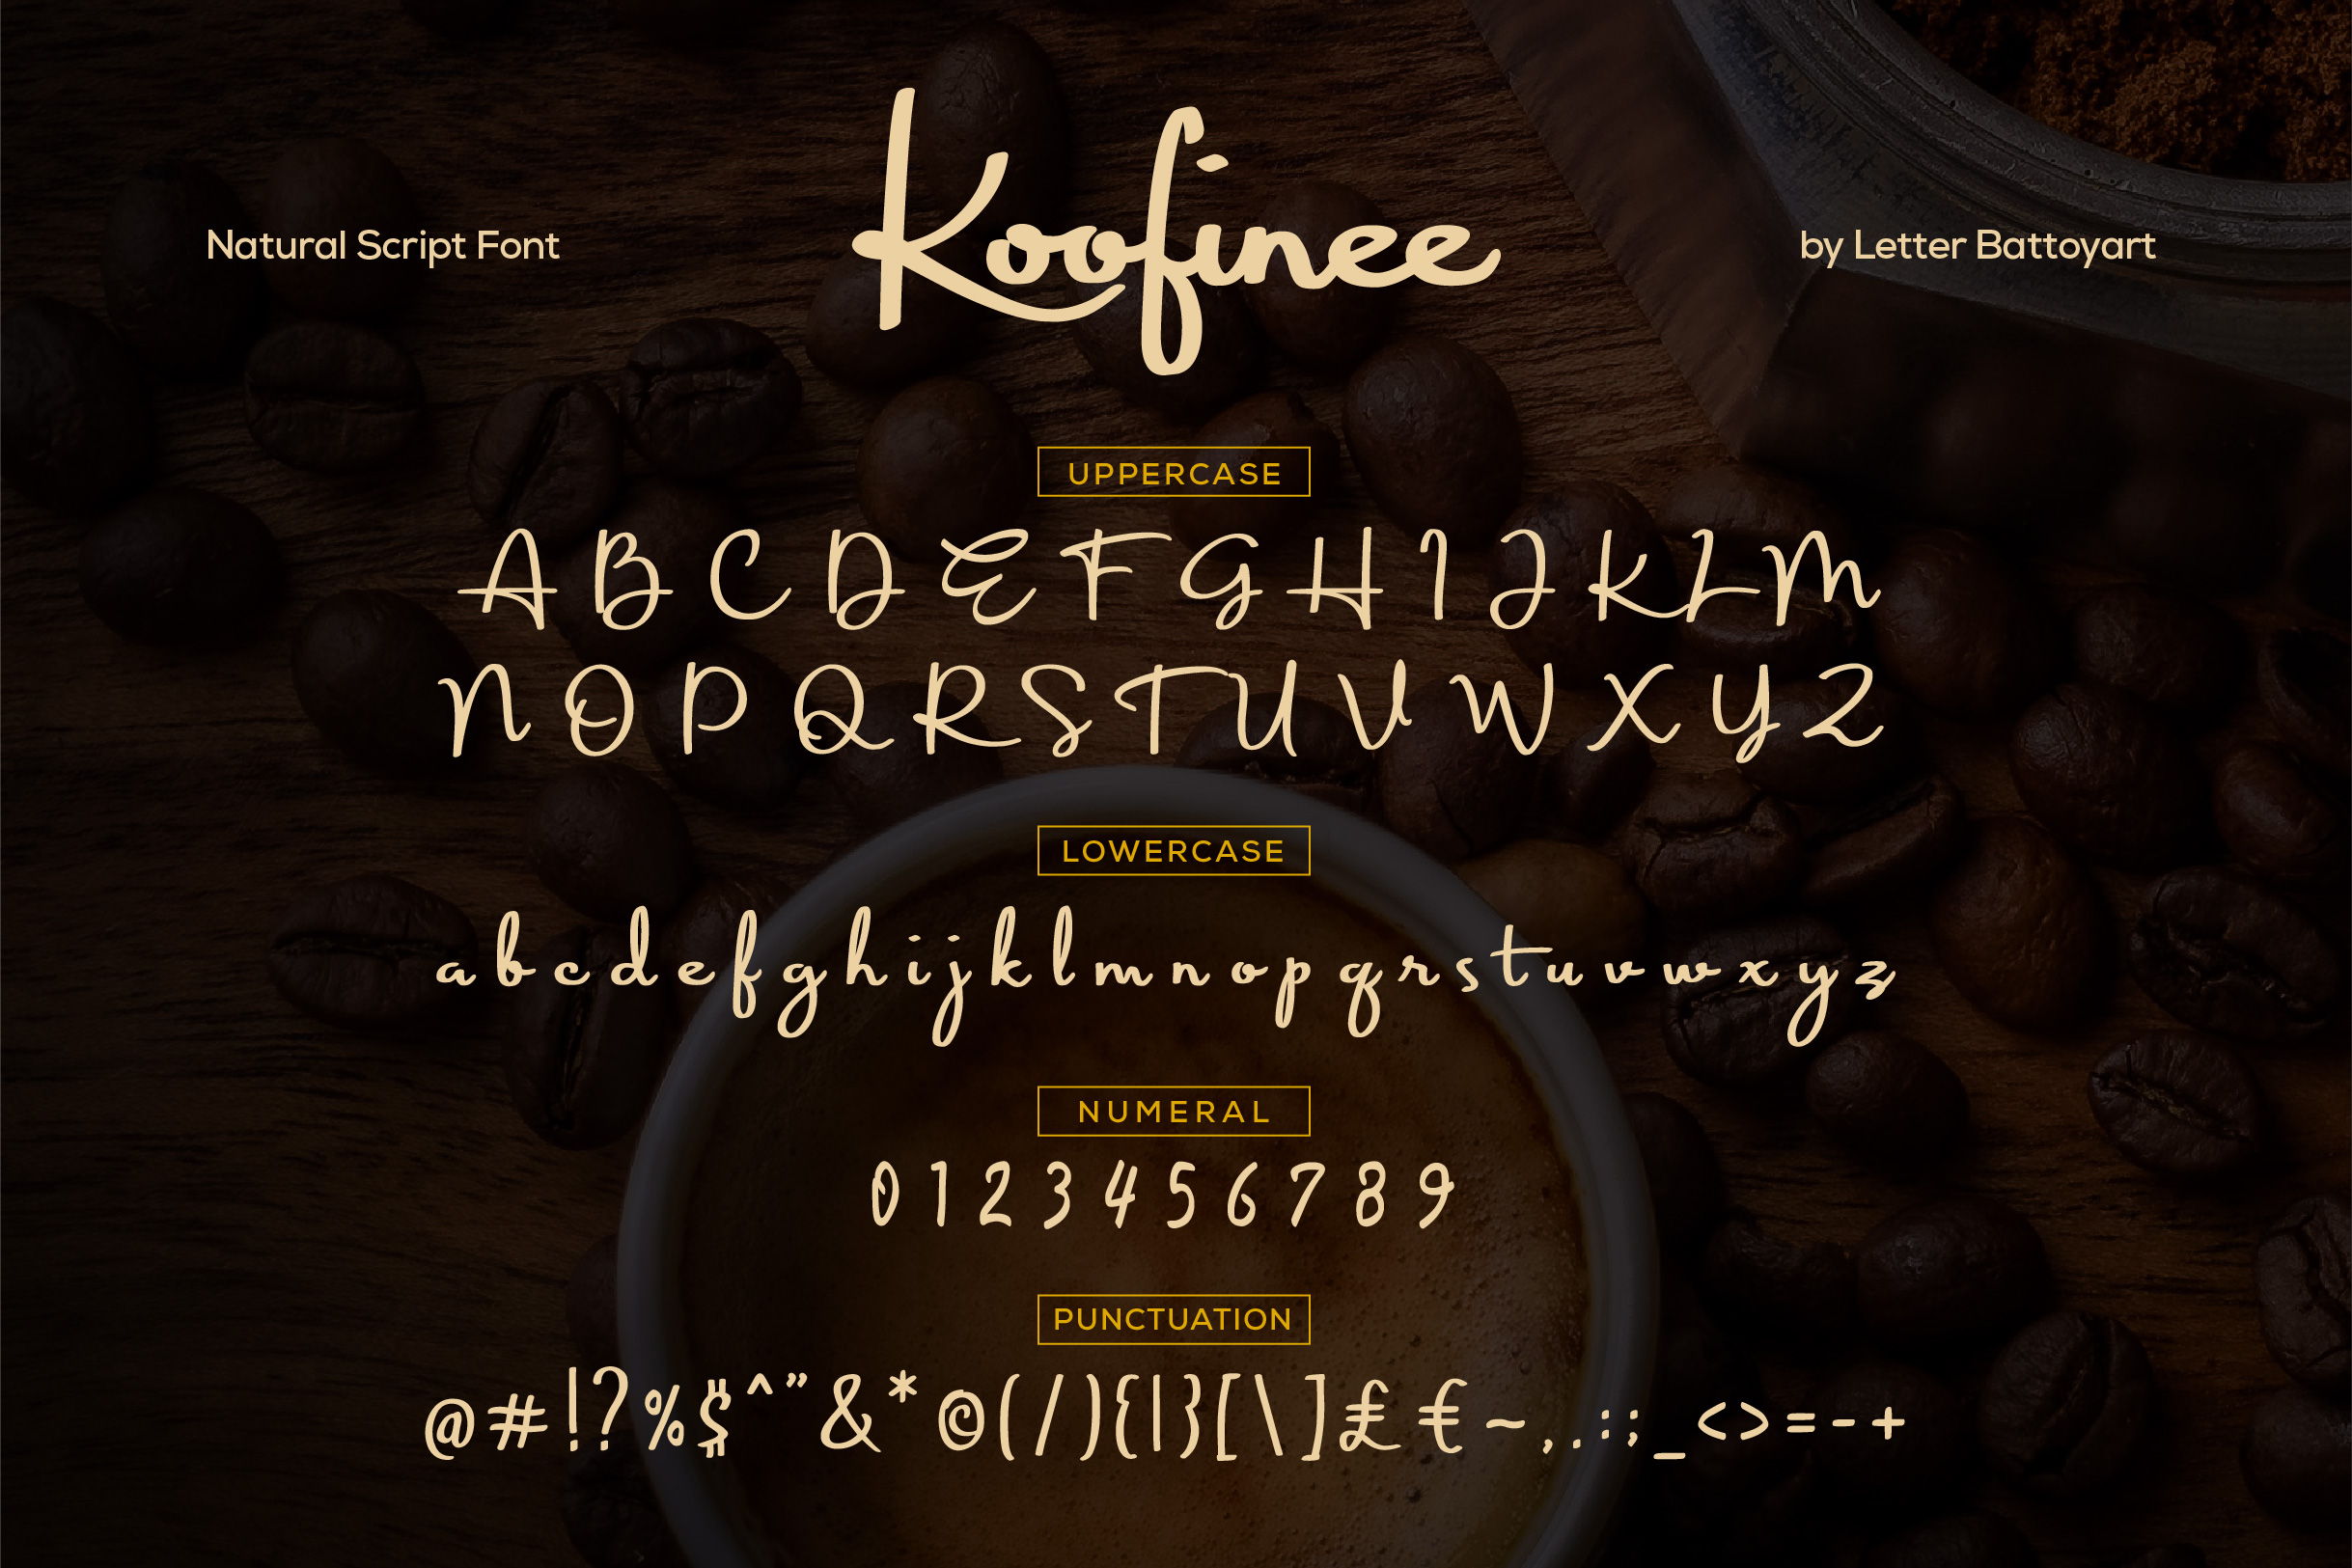 Koofinee Natural Script Font example image 4